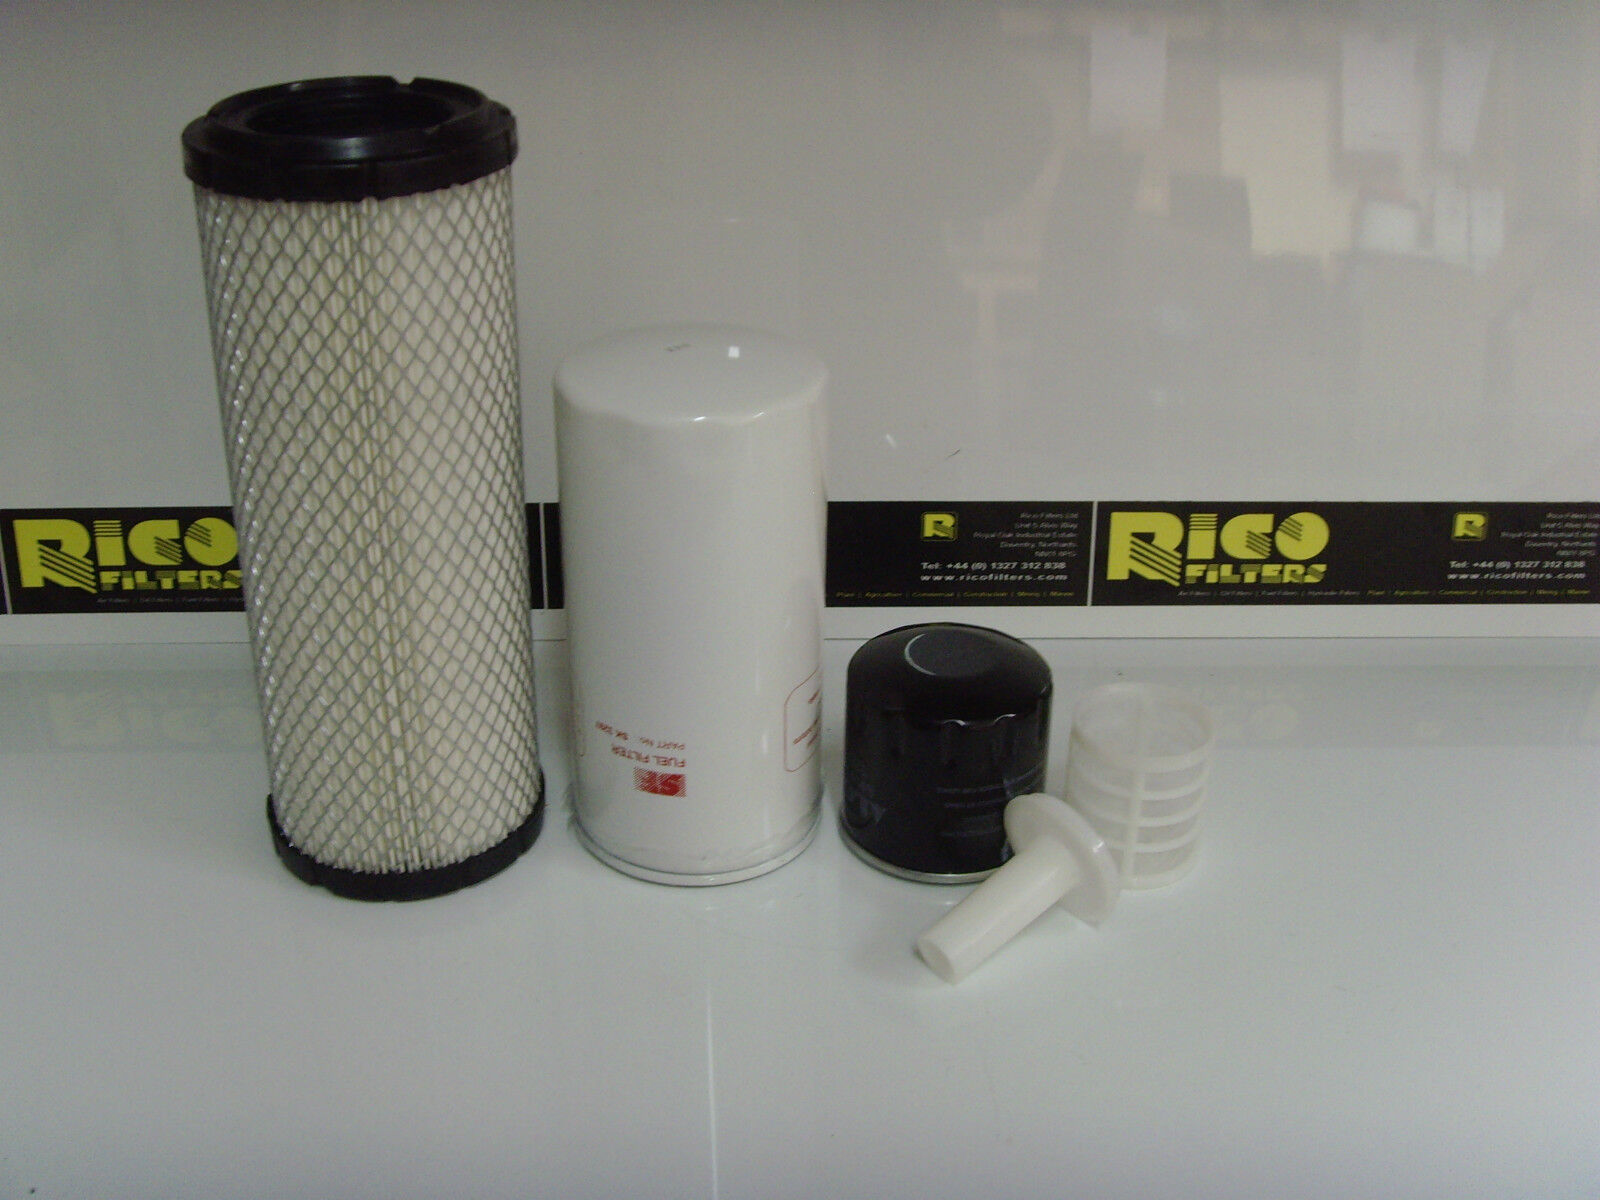 Takechi Tb025 /<1256975 Kit de Service Filtre à Air Huile Filtres Carburant